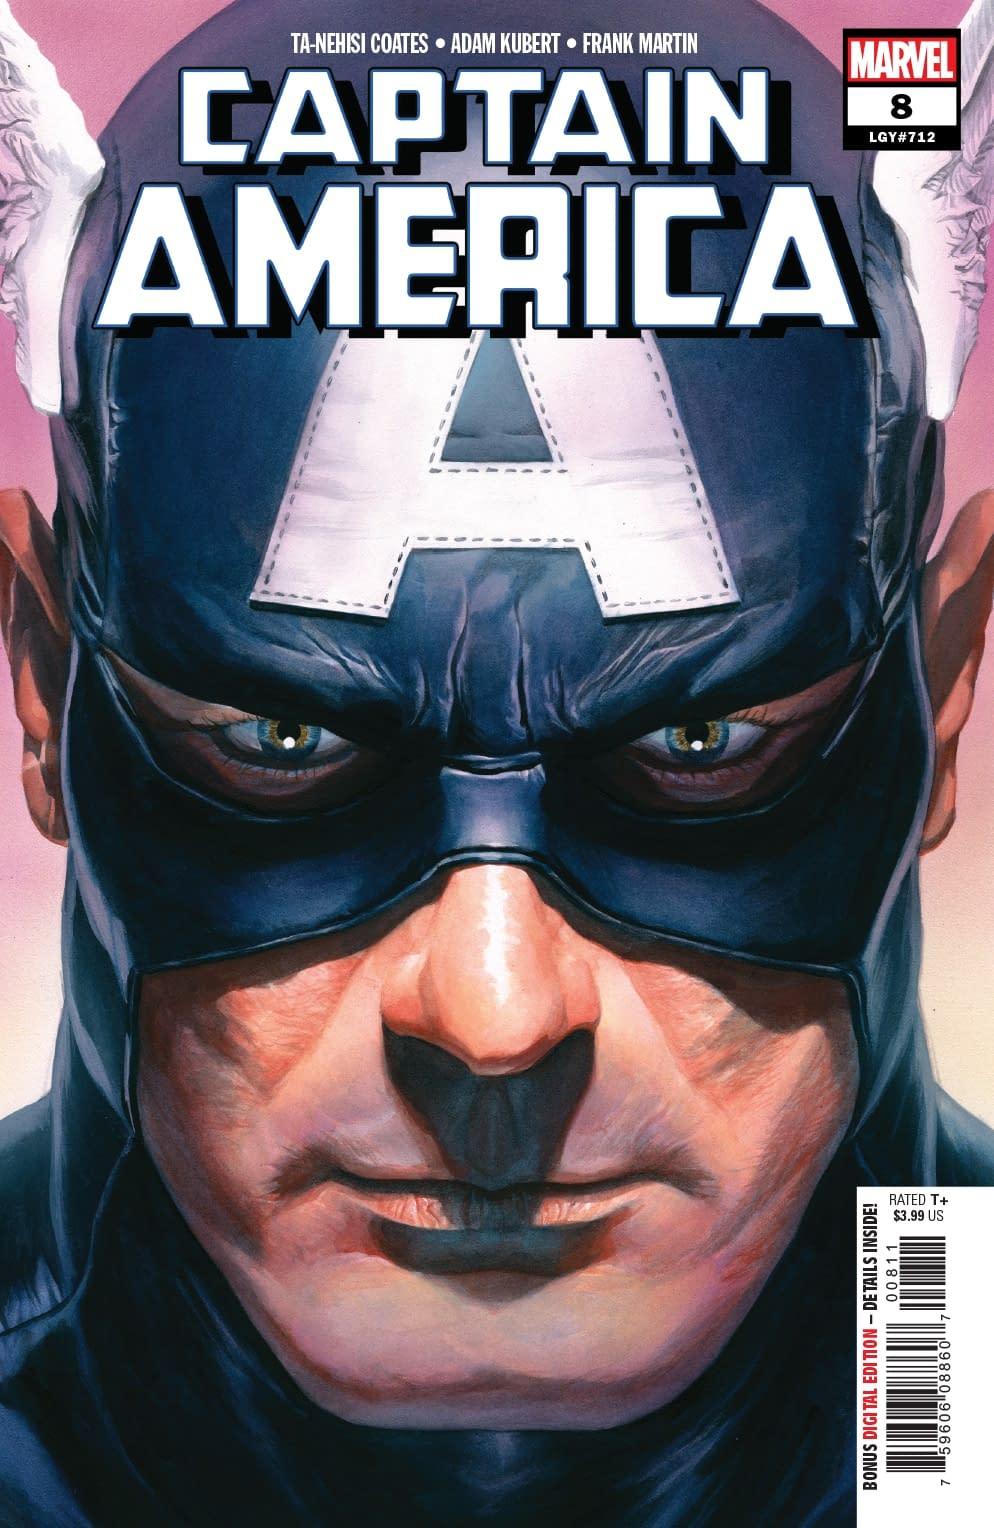 Can Nazi Captain America Buy a Presidential Pardon From Donald Trump?